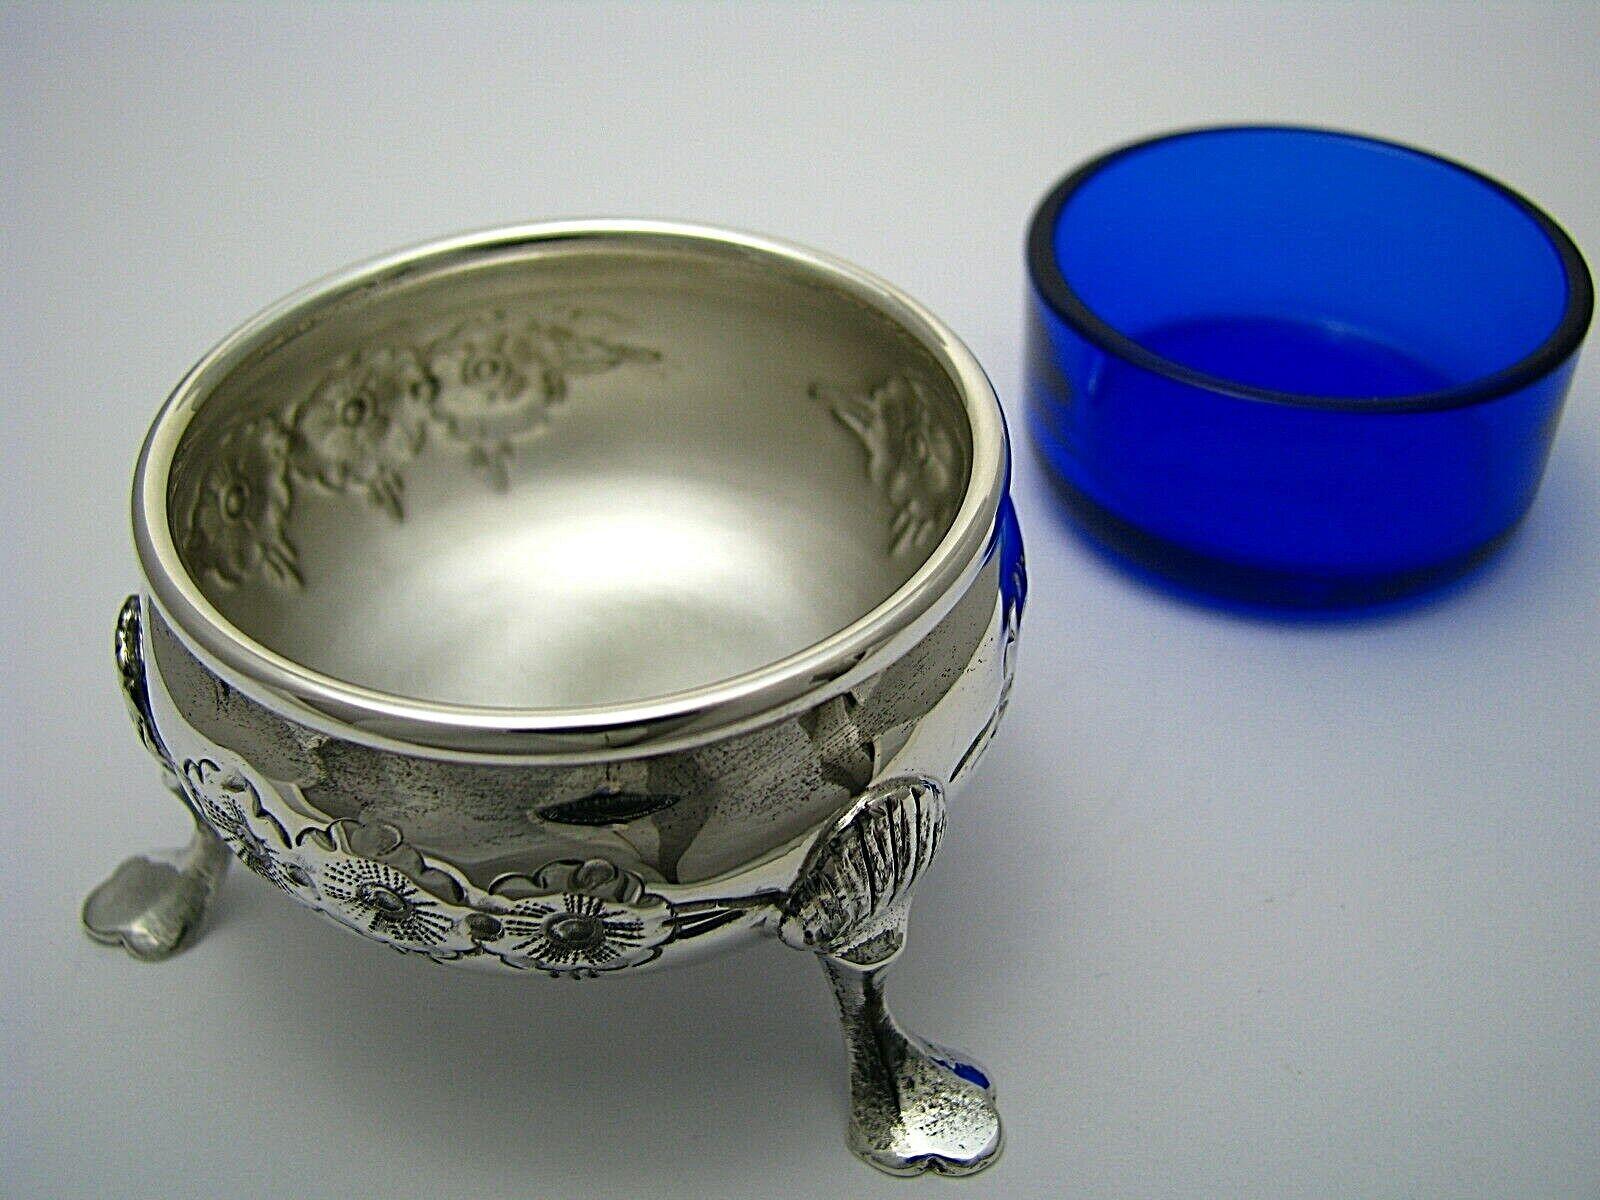 2 STERLING SILVER SALT CELLARS COBALT GLASS LINERS Baldwin Miller C1950s Rare  - $295.00